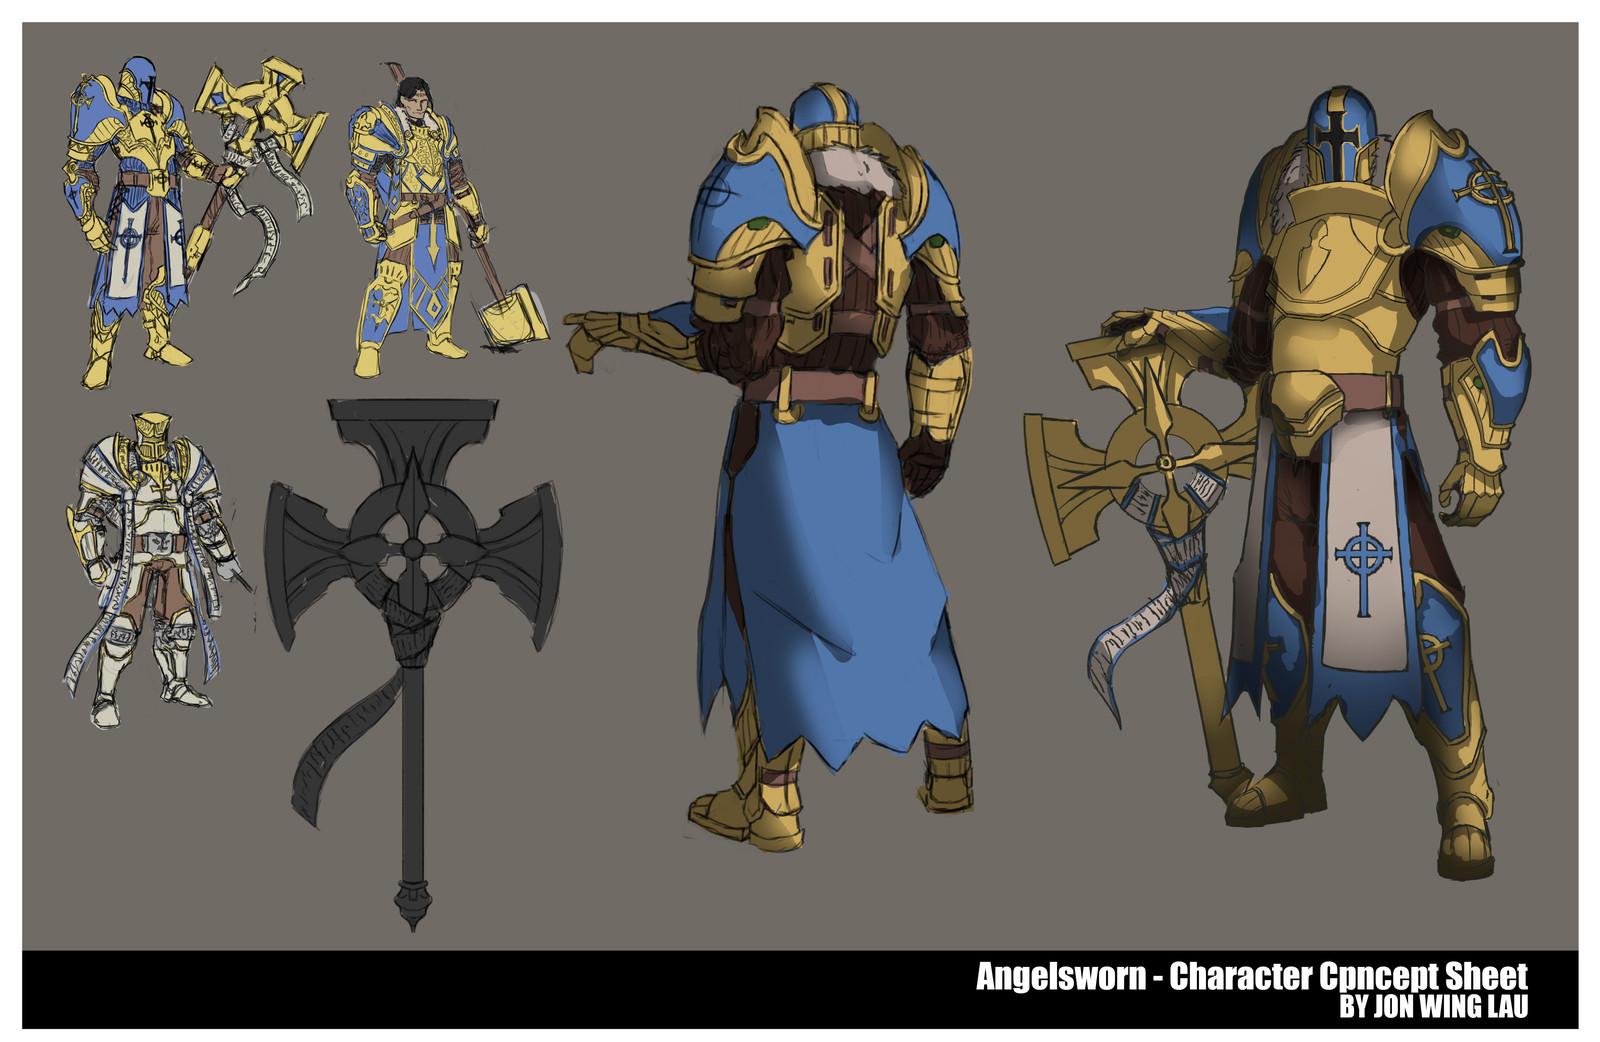 Angelsworn - Character Concept Sheet